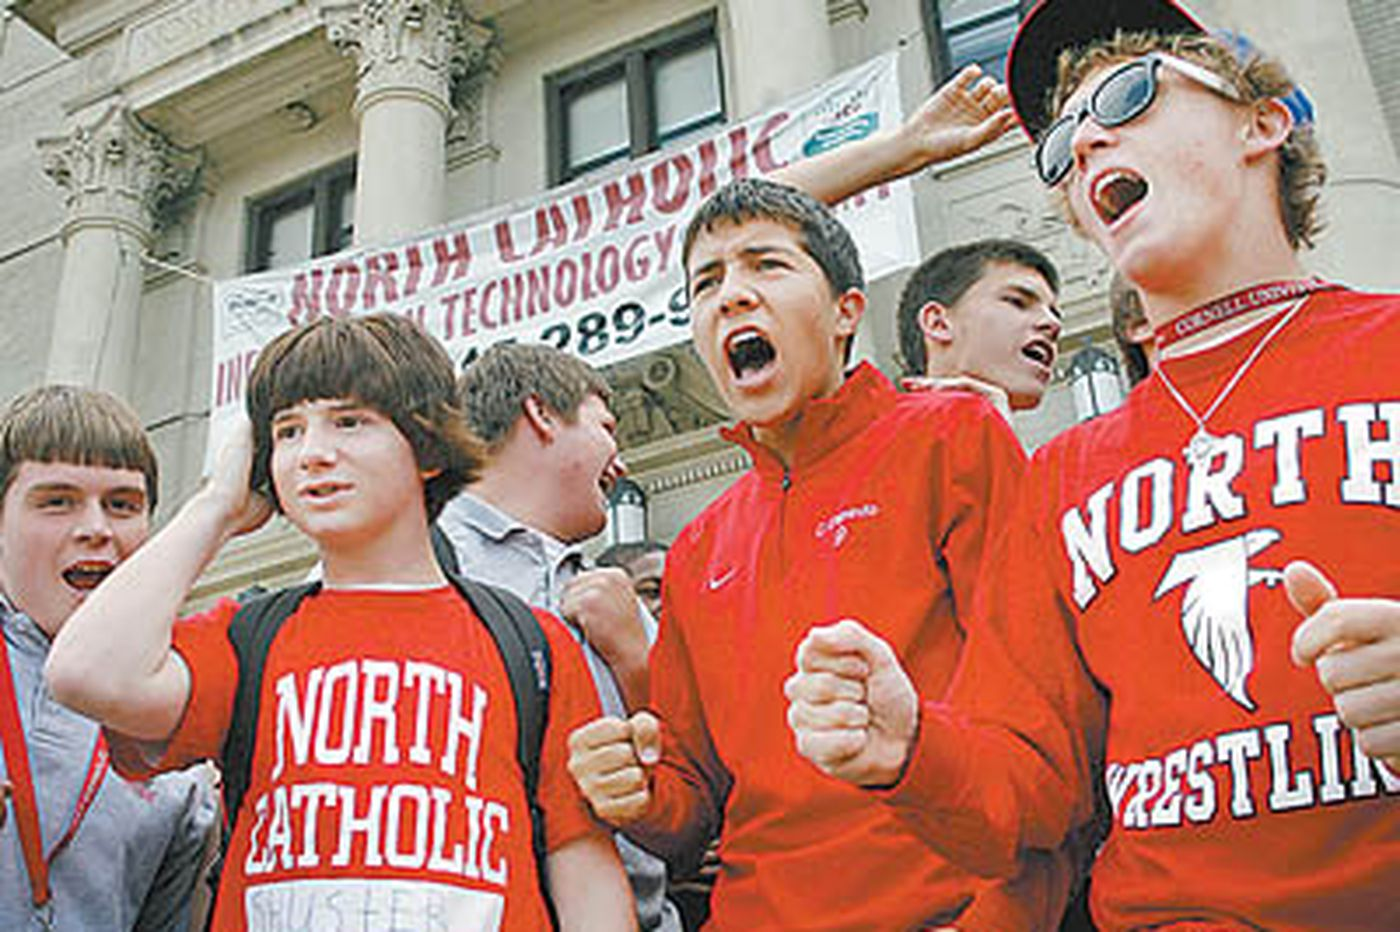 Plans to shut 2 Catholic schools prompt sadness